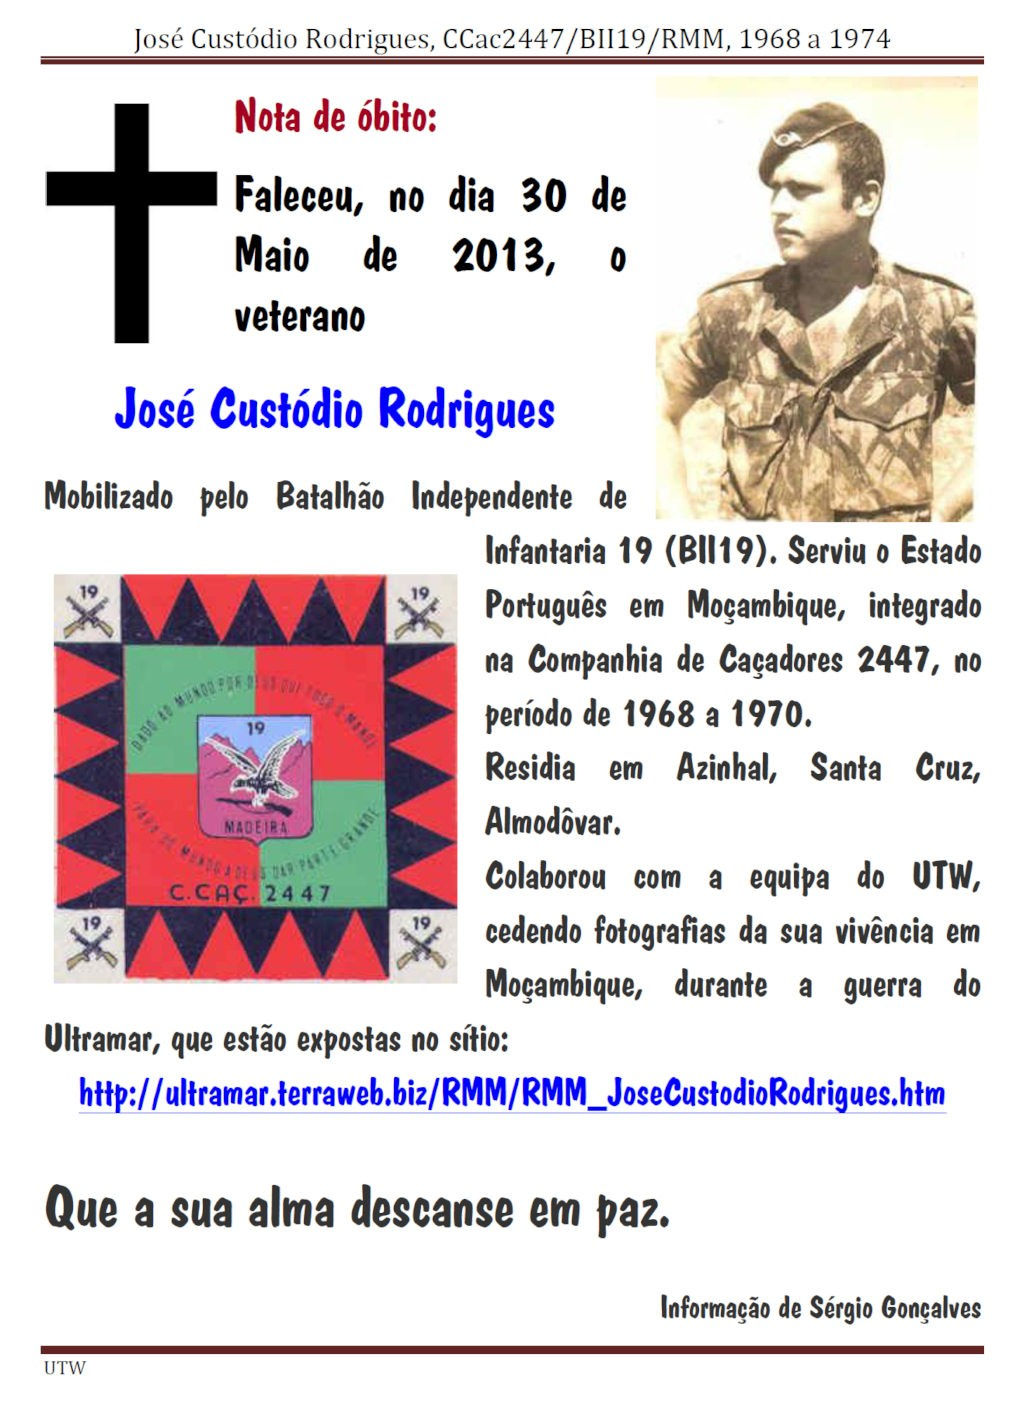 Faleceu o veterano José Custódio Rodrigues - CCac2447/BII19/RMM - 30Mai2013 Josacu10